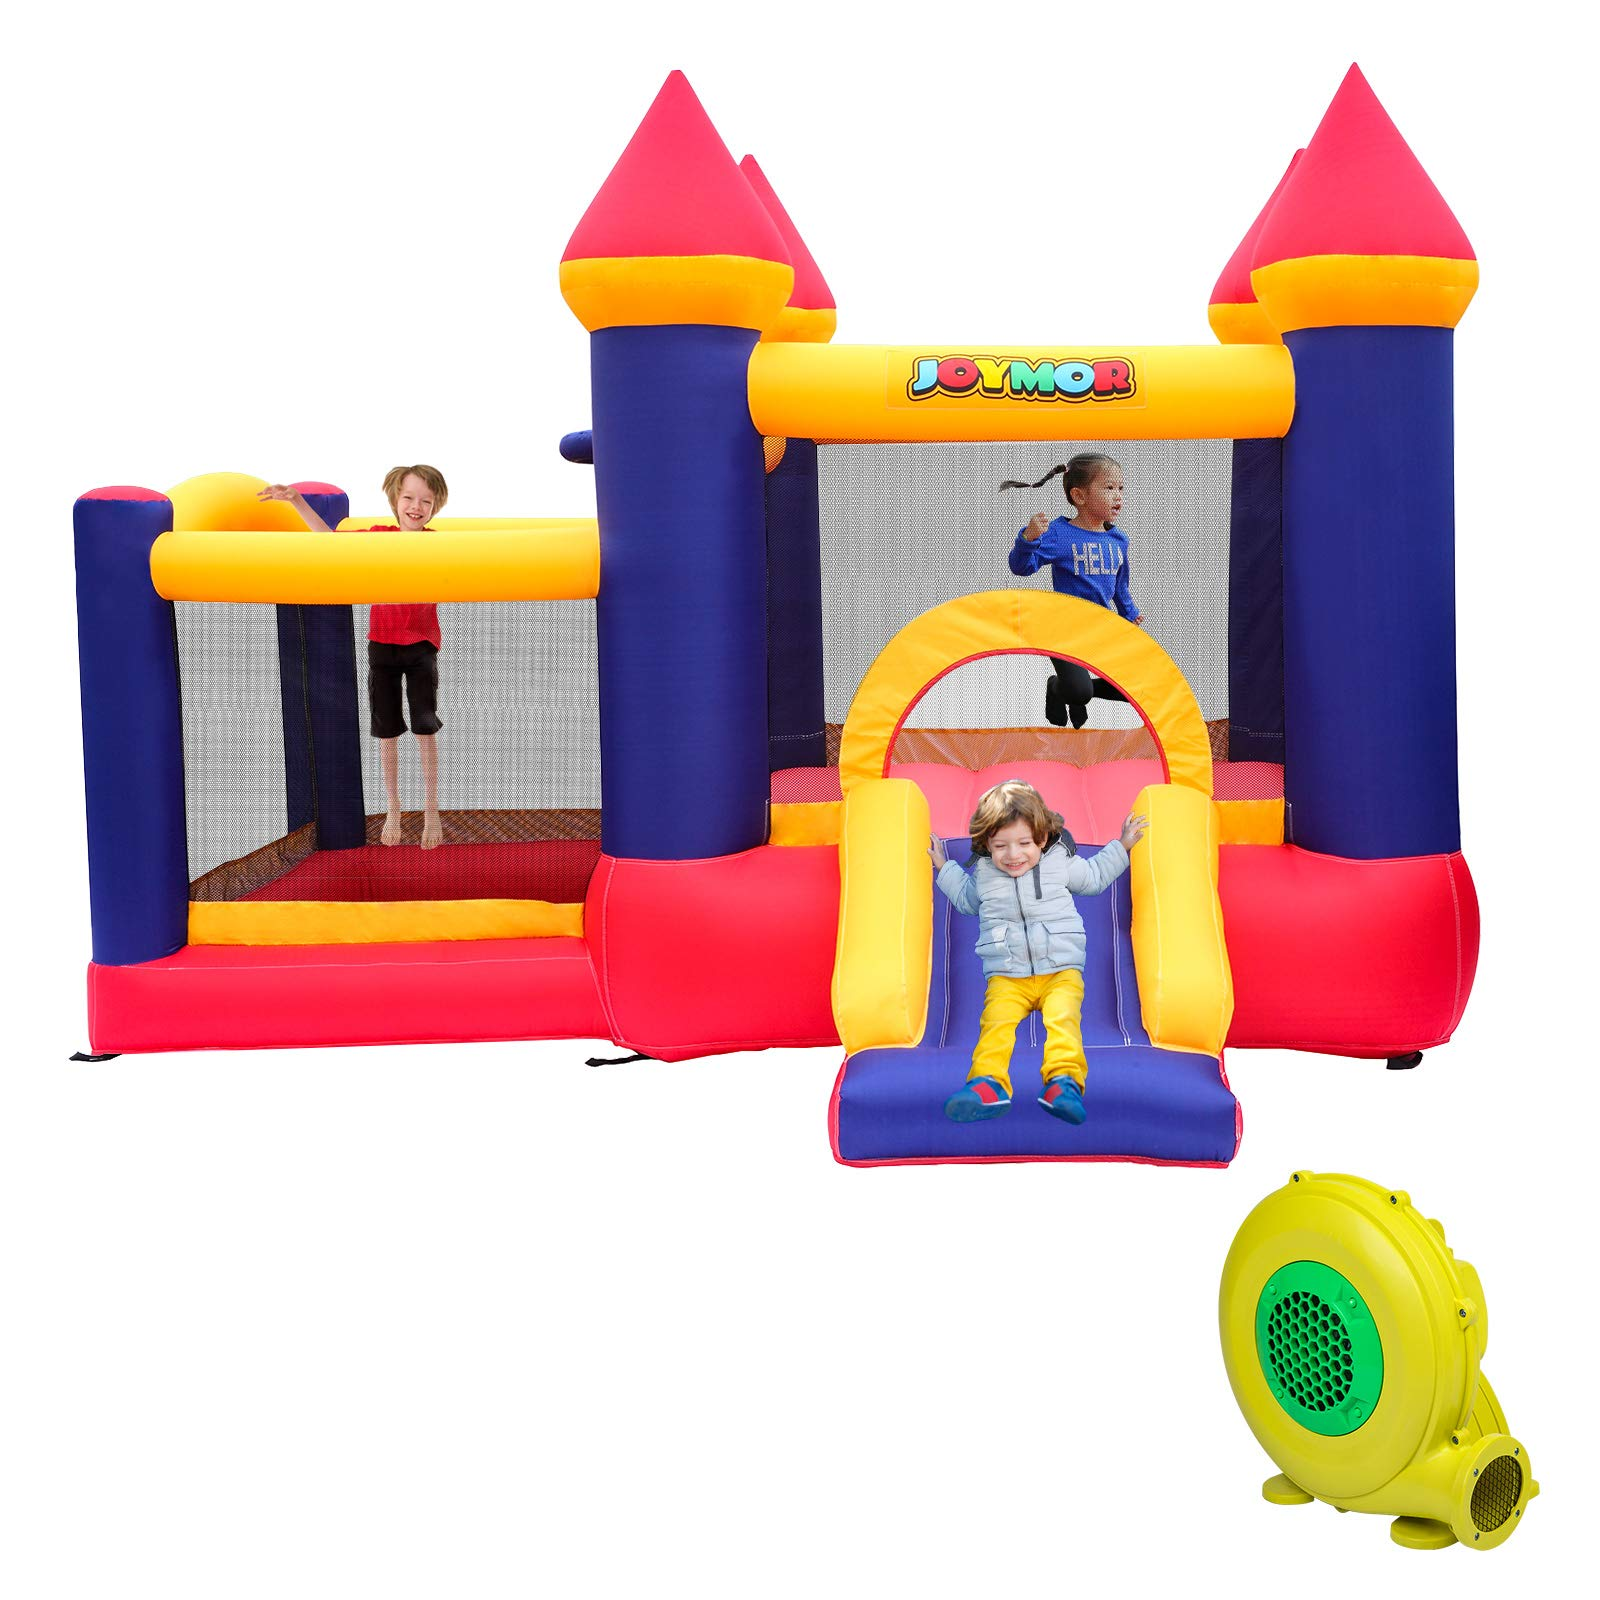 JOYMOR Bounce House Little Kids Inflatable Bouncing Castle Play Center w/ Air Blower Pump, Slide Bouncer (10' x 9')